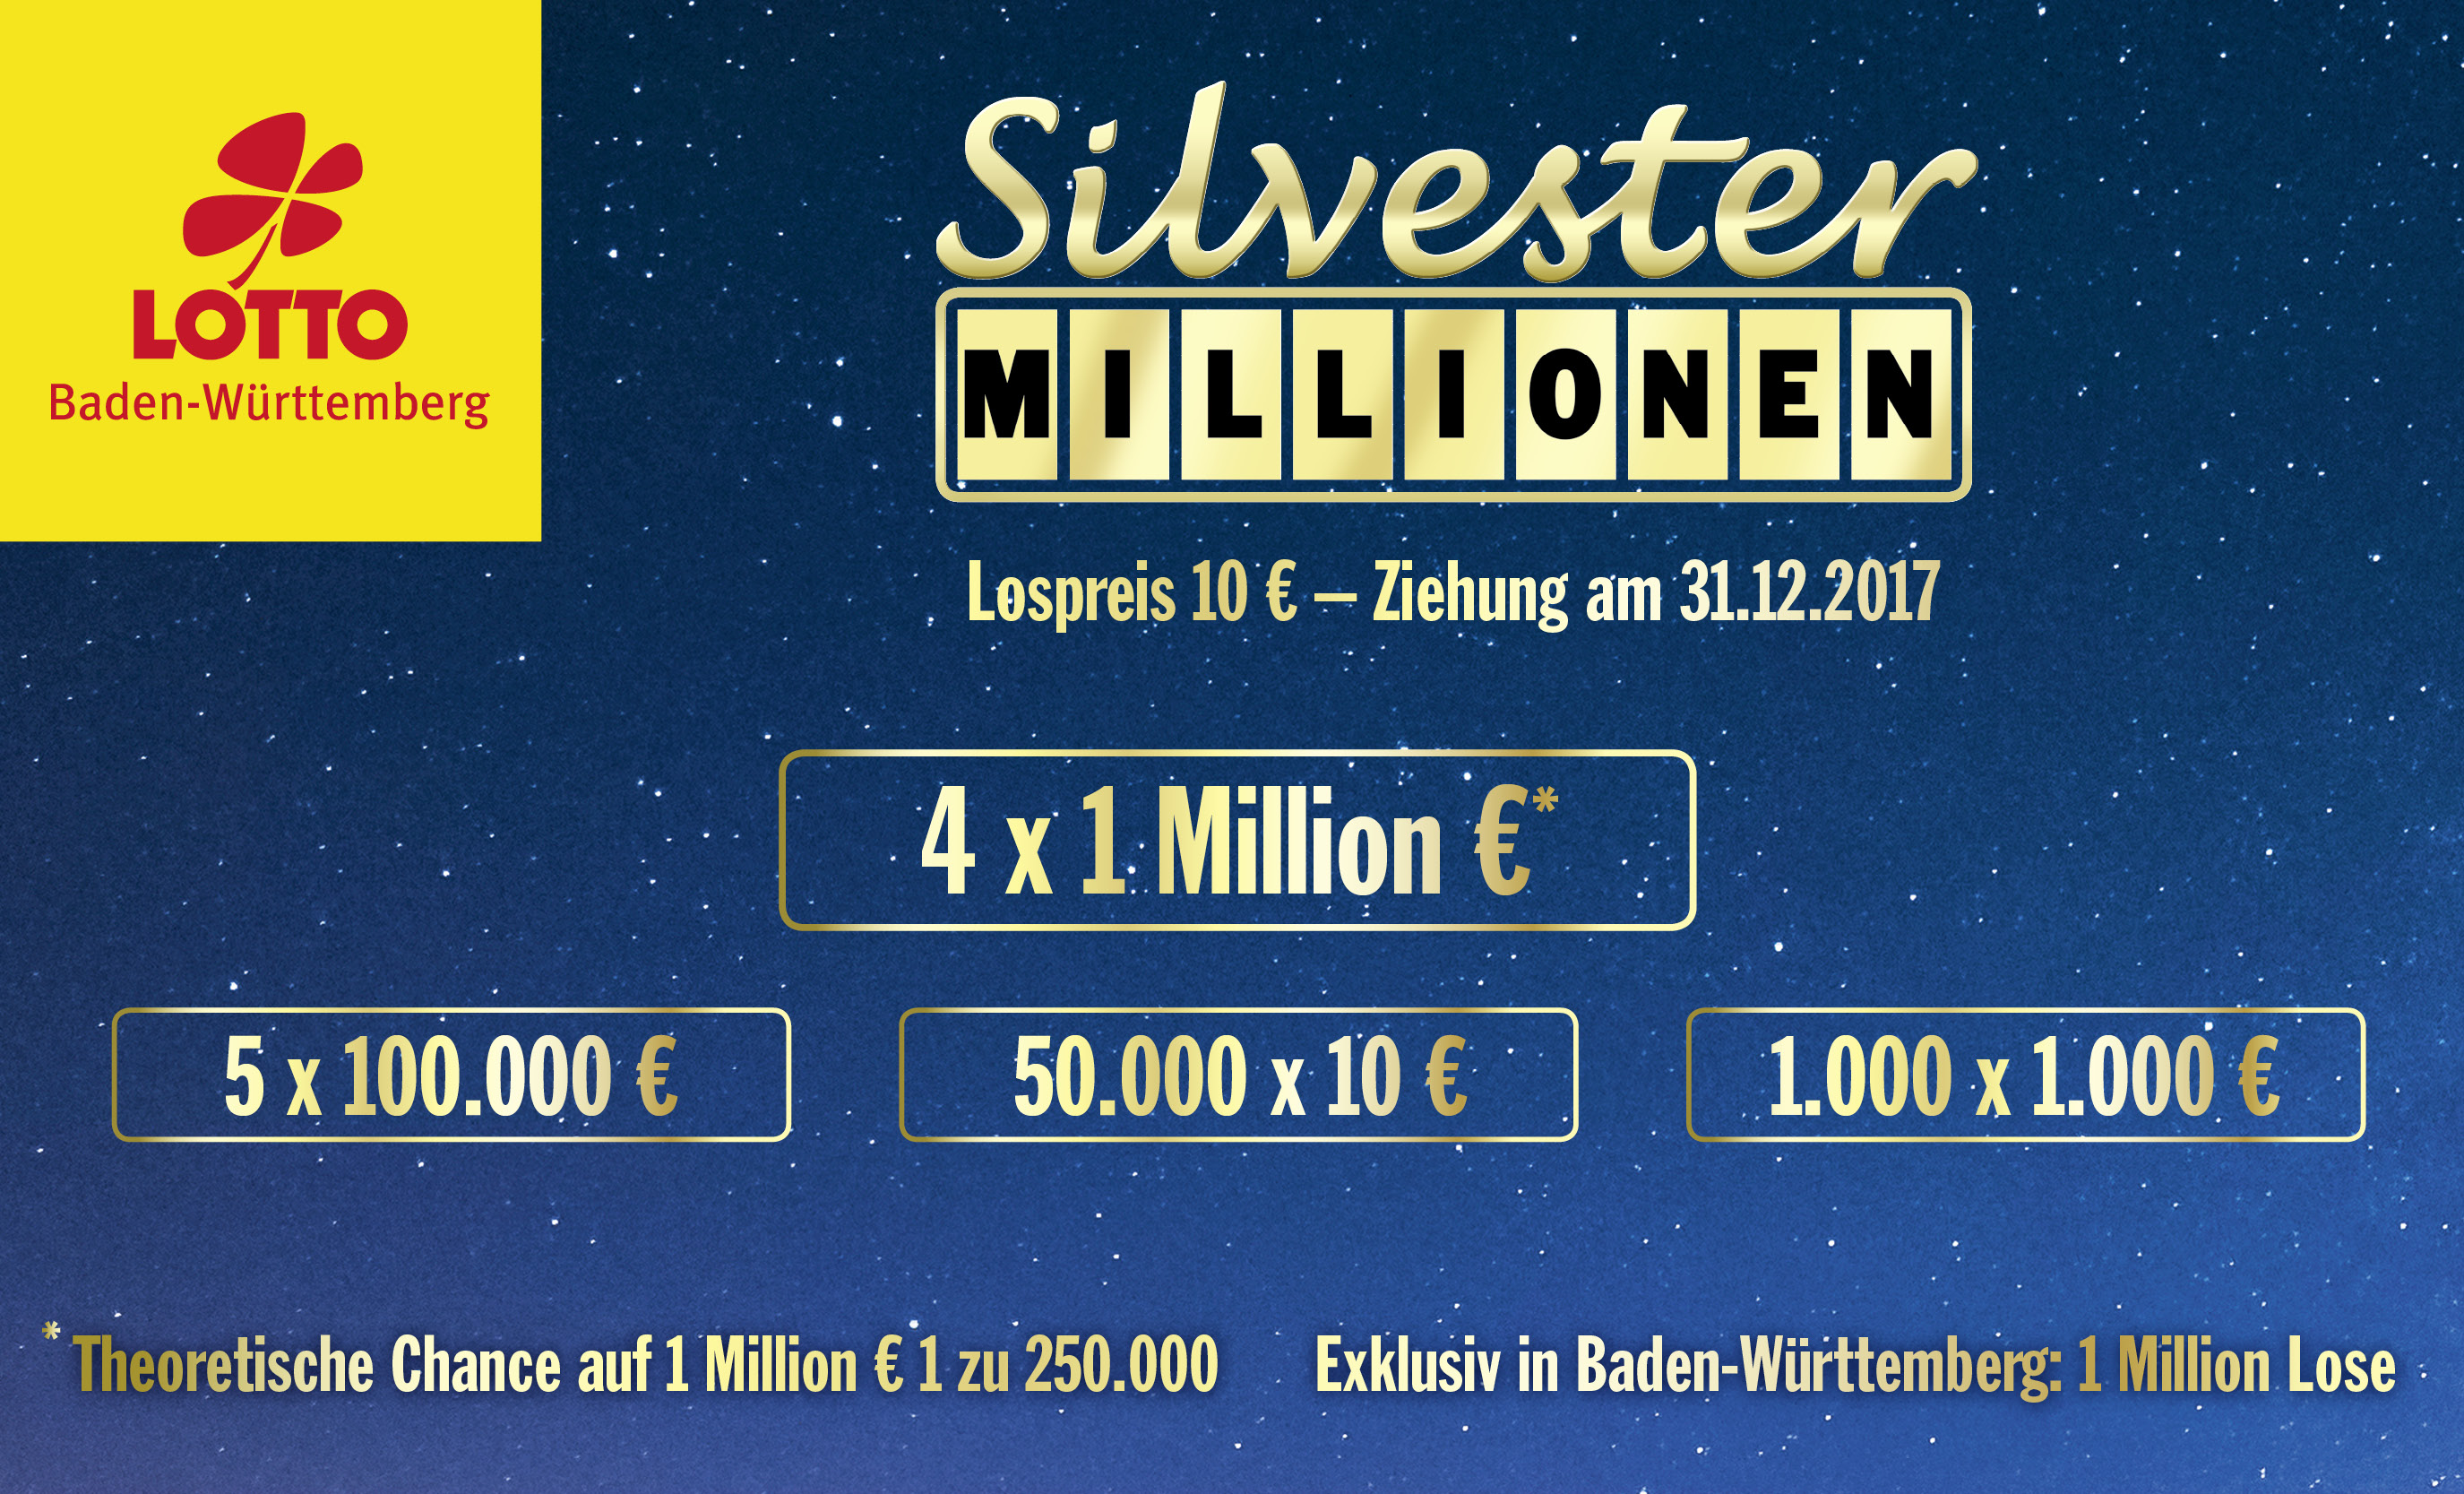 Sylvester Millionen